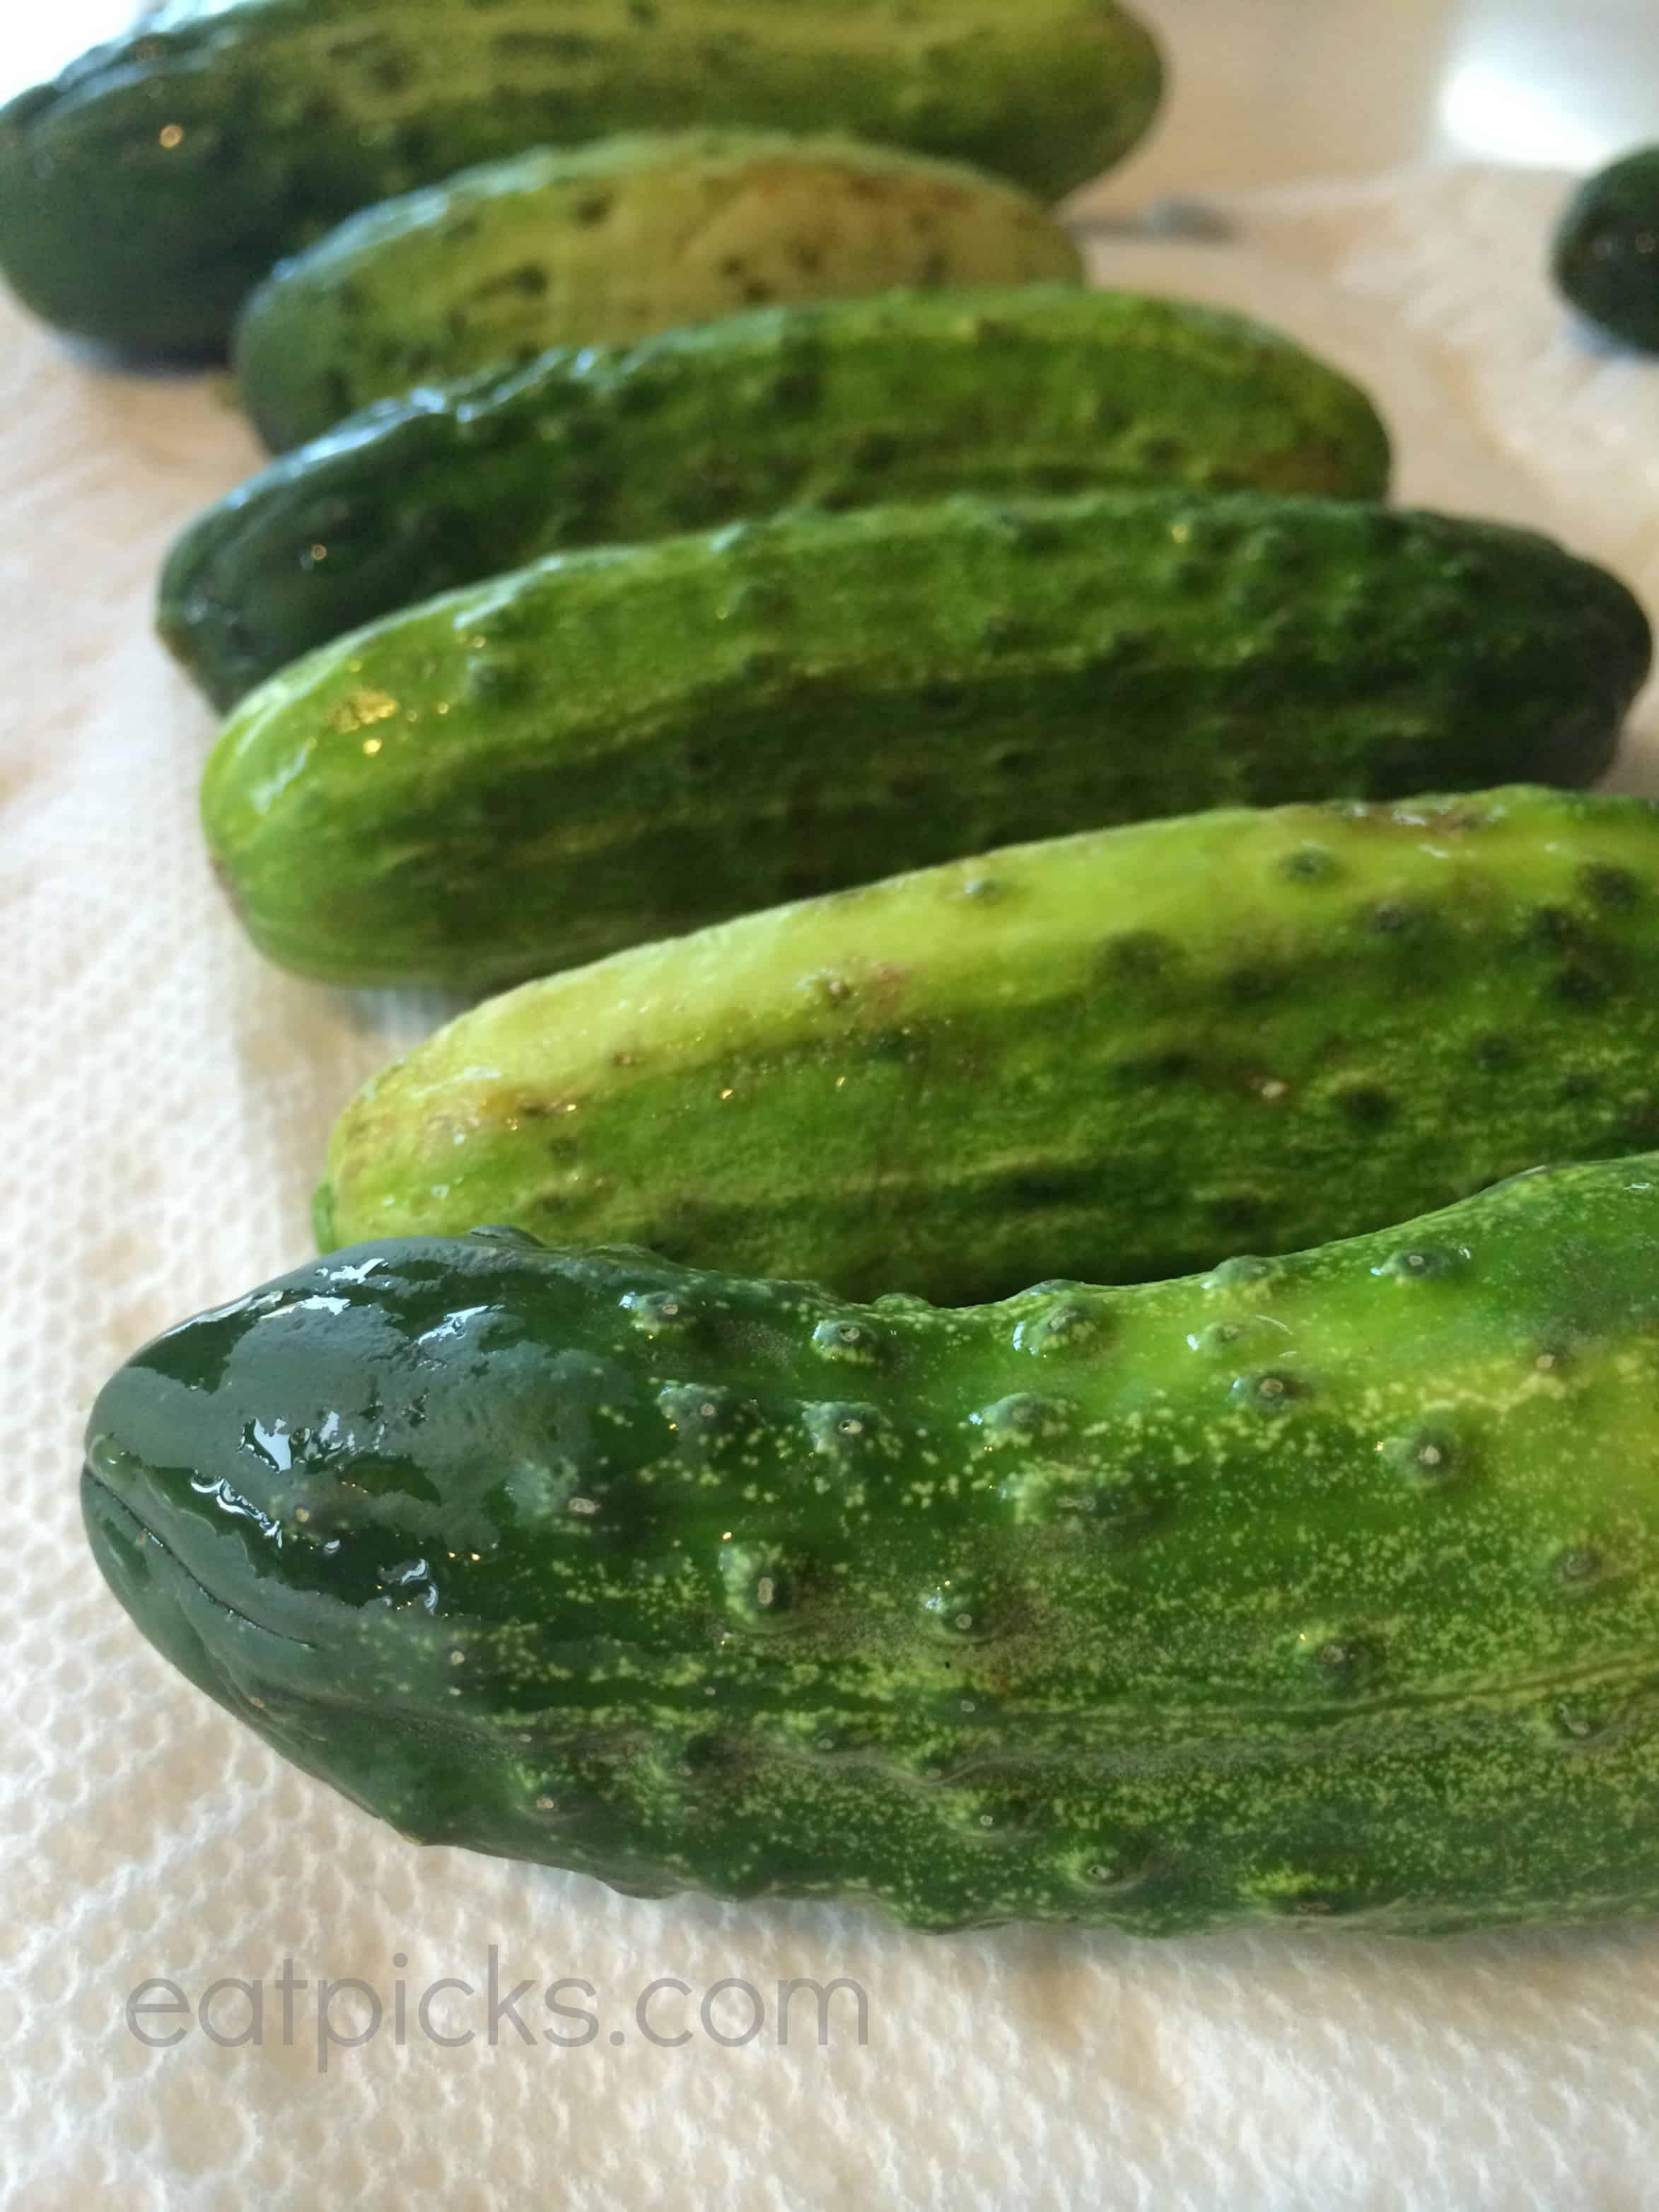 kirby cucumbers garlic dill pickles eatpicks